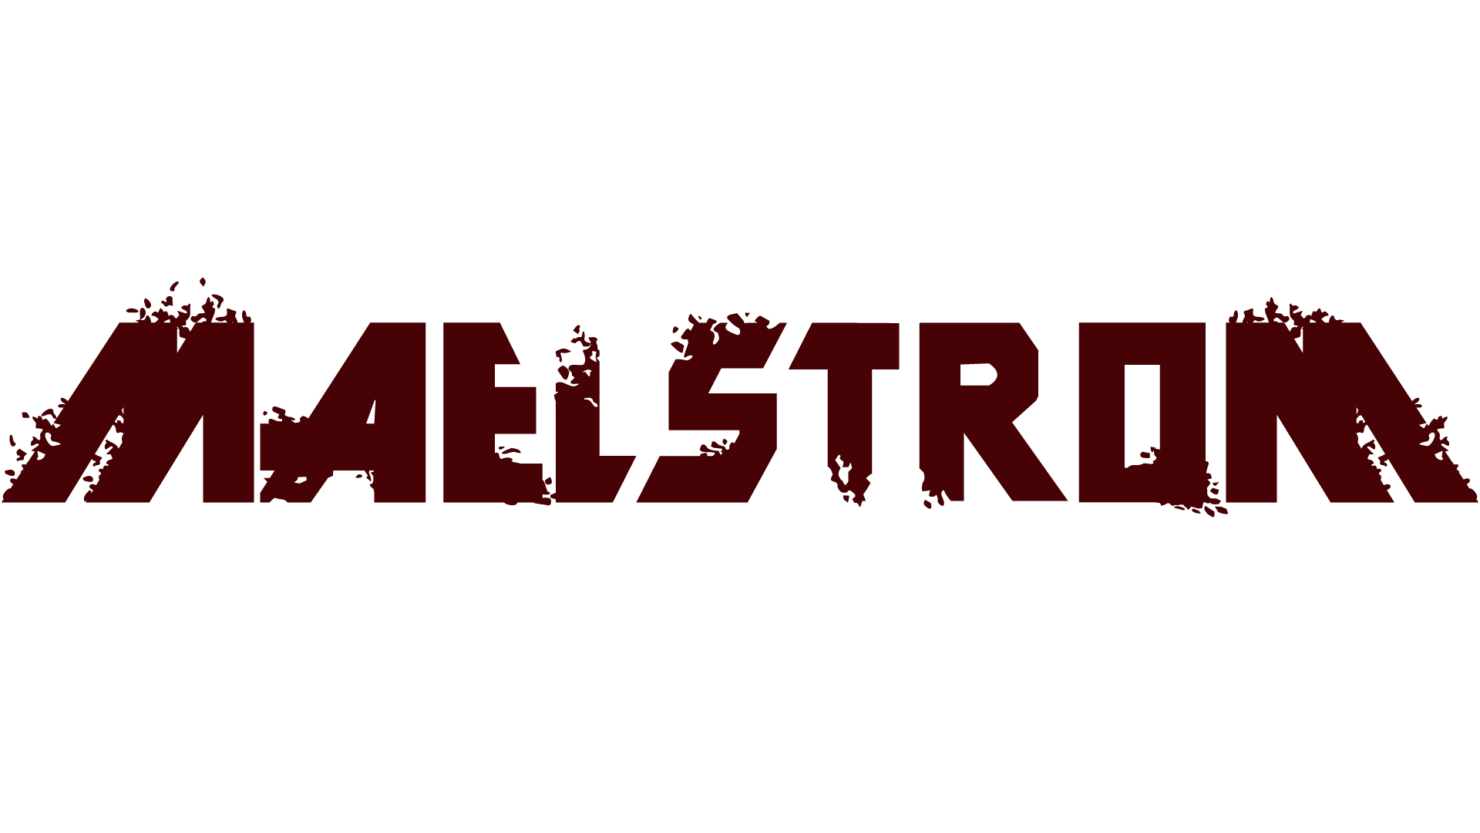 maelstrom_text_logotype